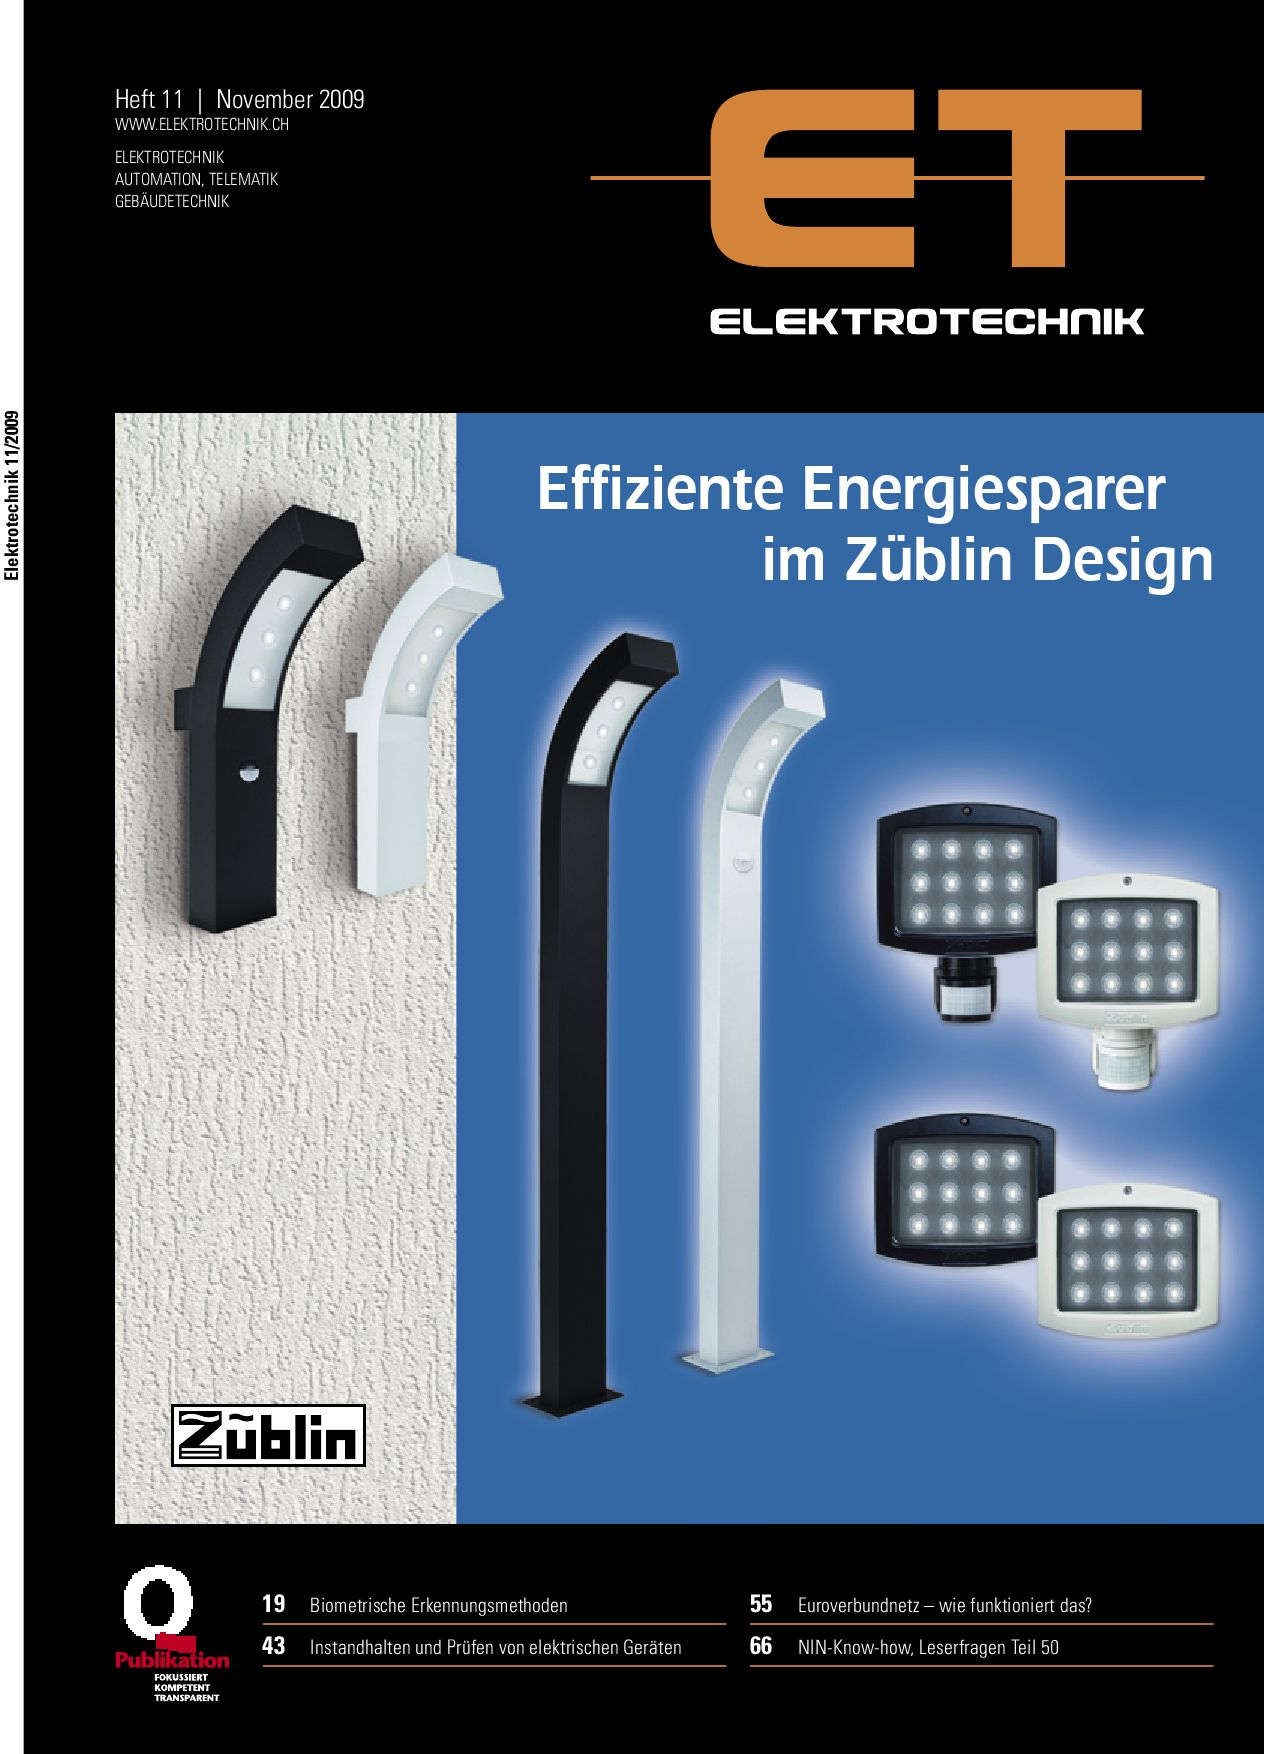 Elektrotechnik 2009/11 by Daniel Gugger - issuu